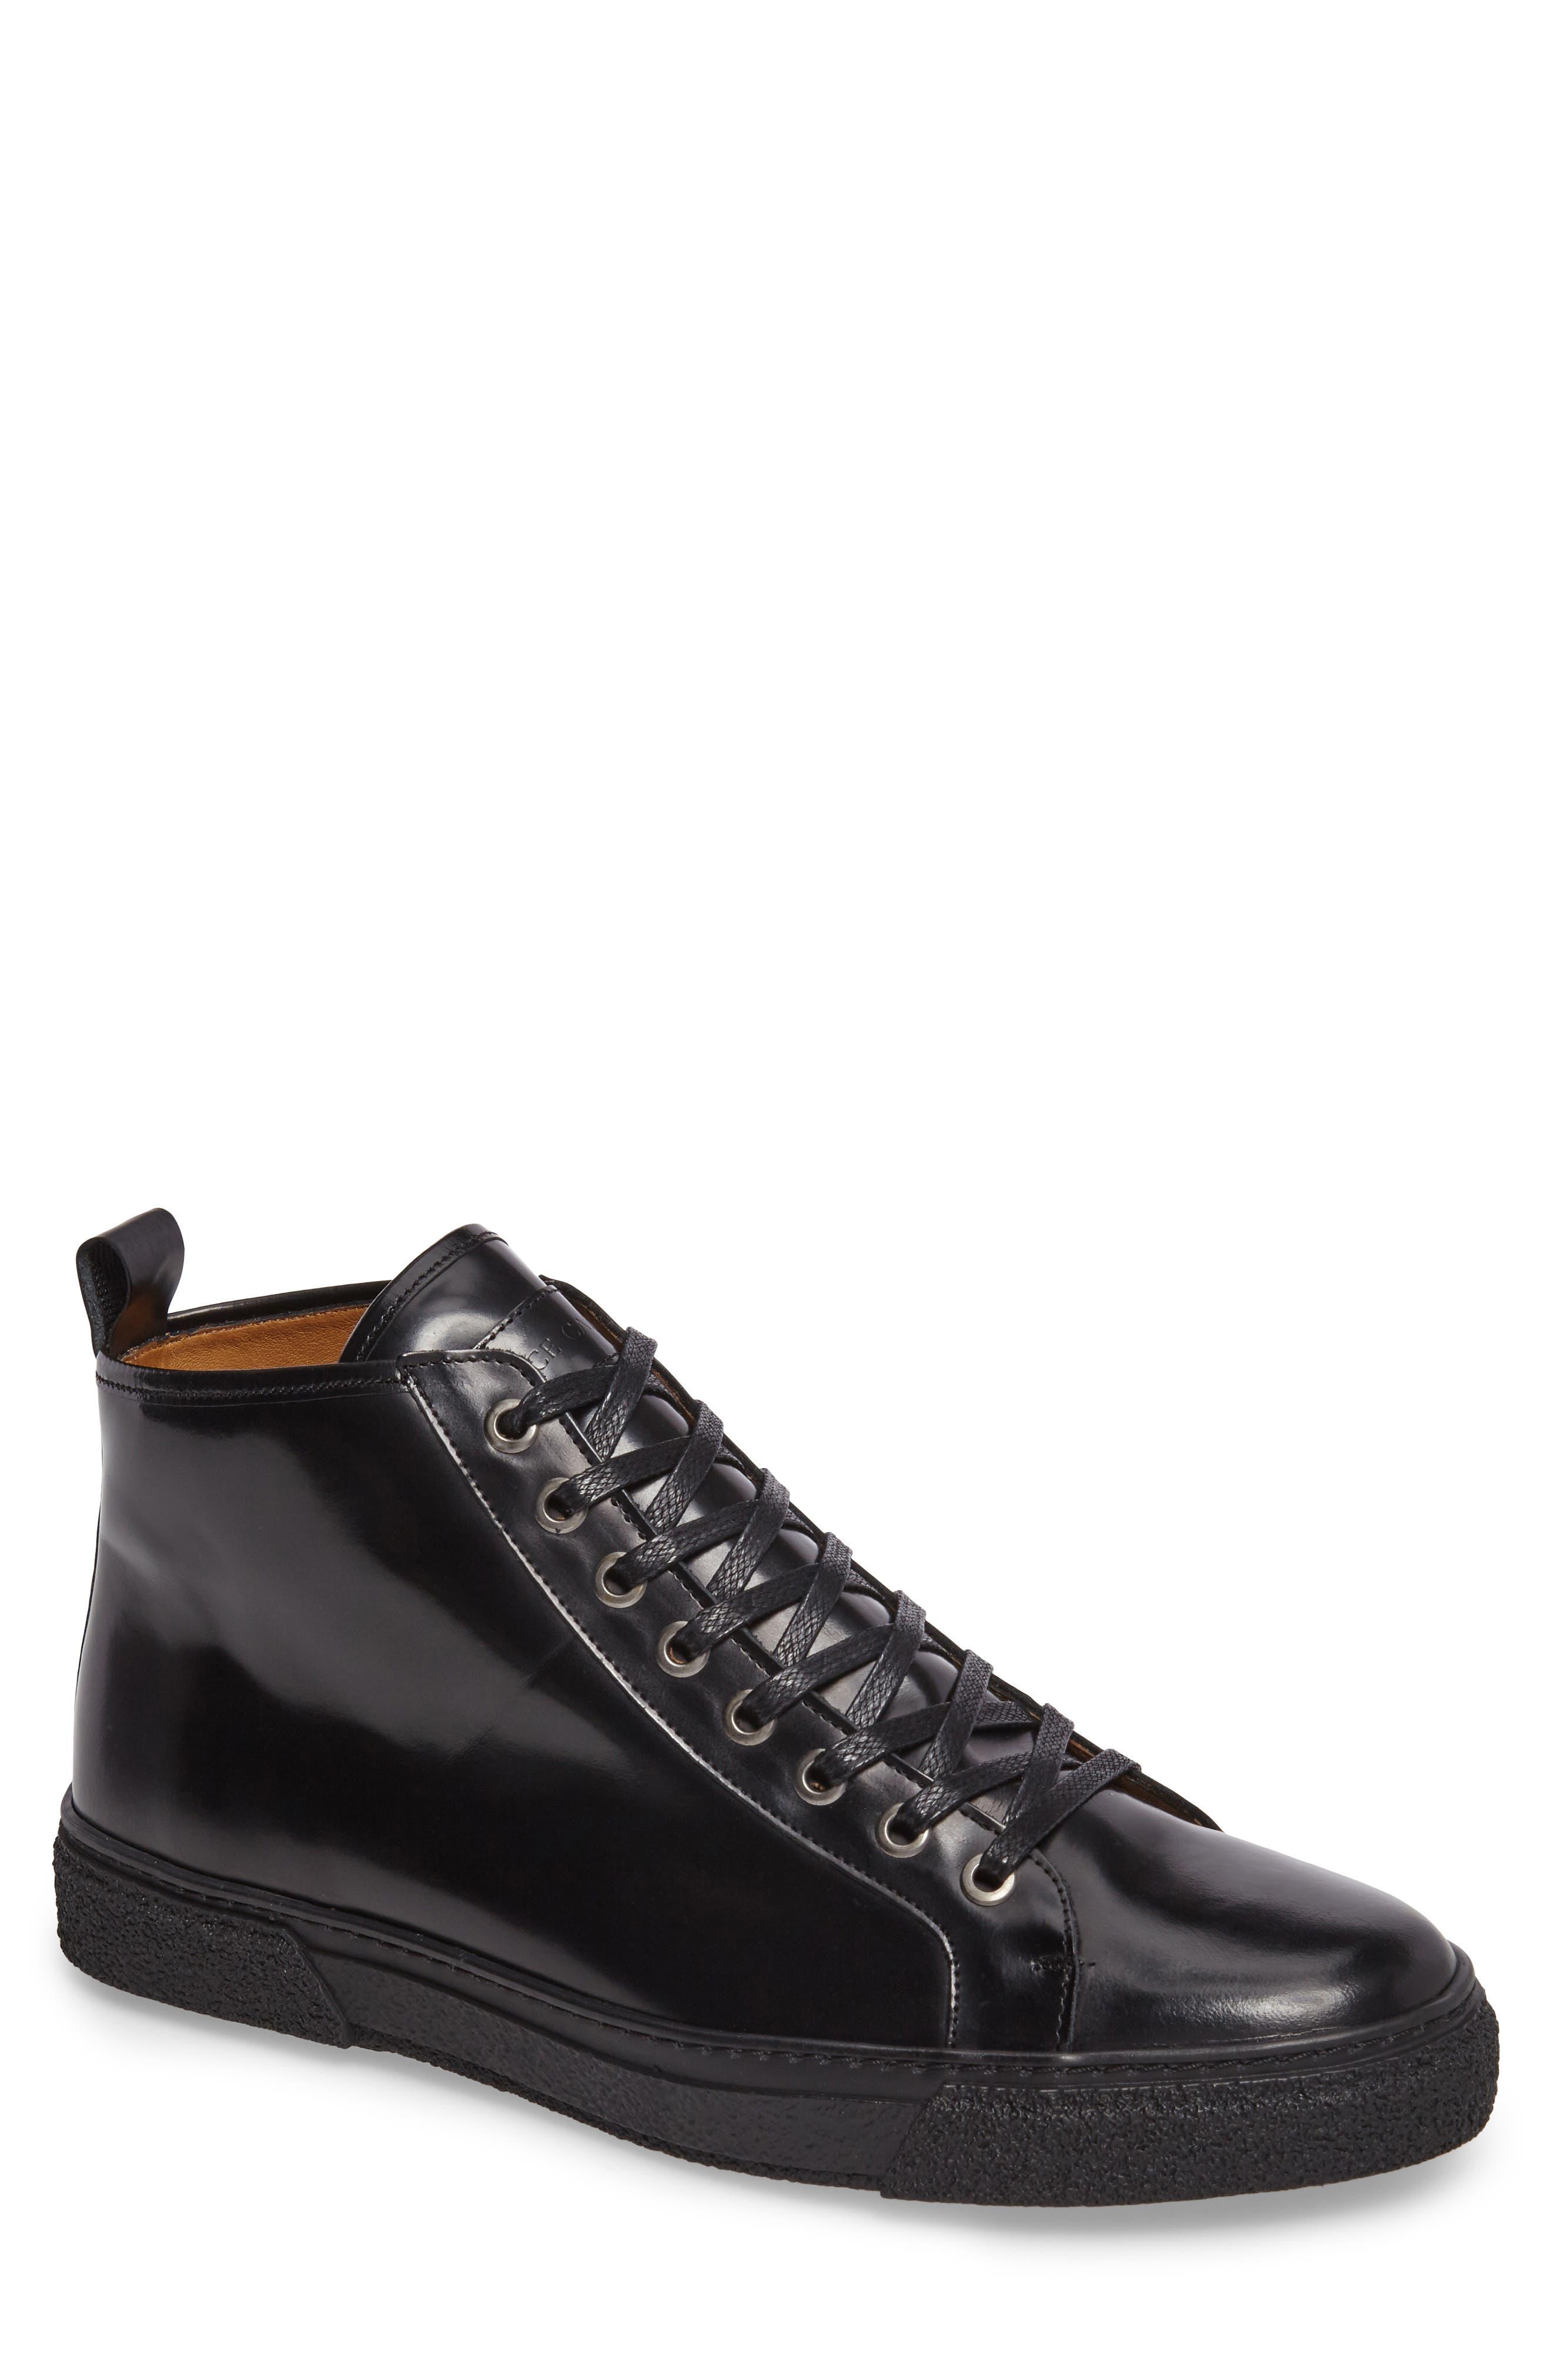 Alternate Image 1 Selected - Vince Camuto Westan Sneaker (Men)